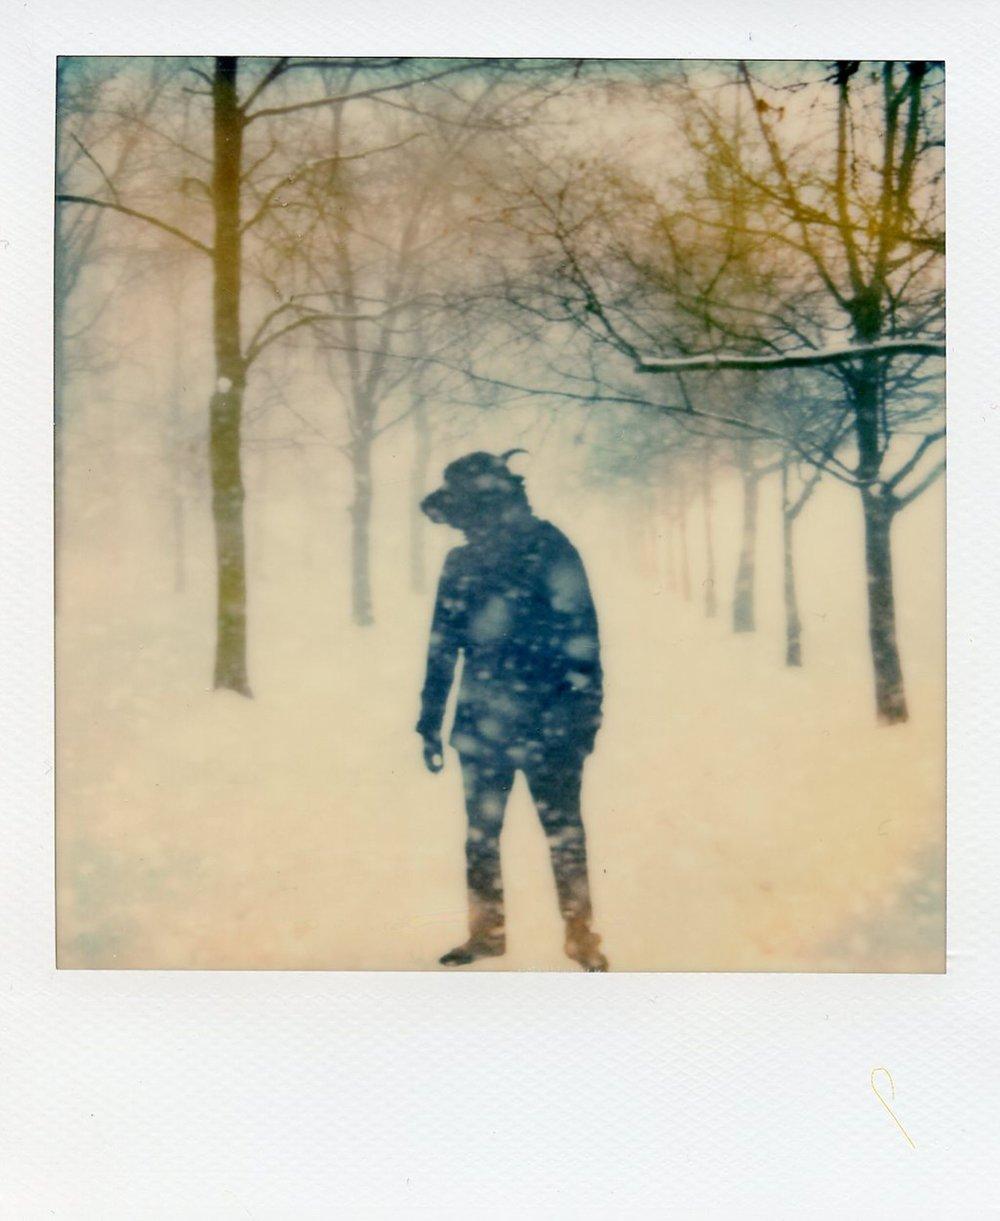 The Daimon Chroniles - Snowfall - Yak - Alan Marcheselli.jpg